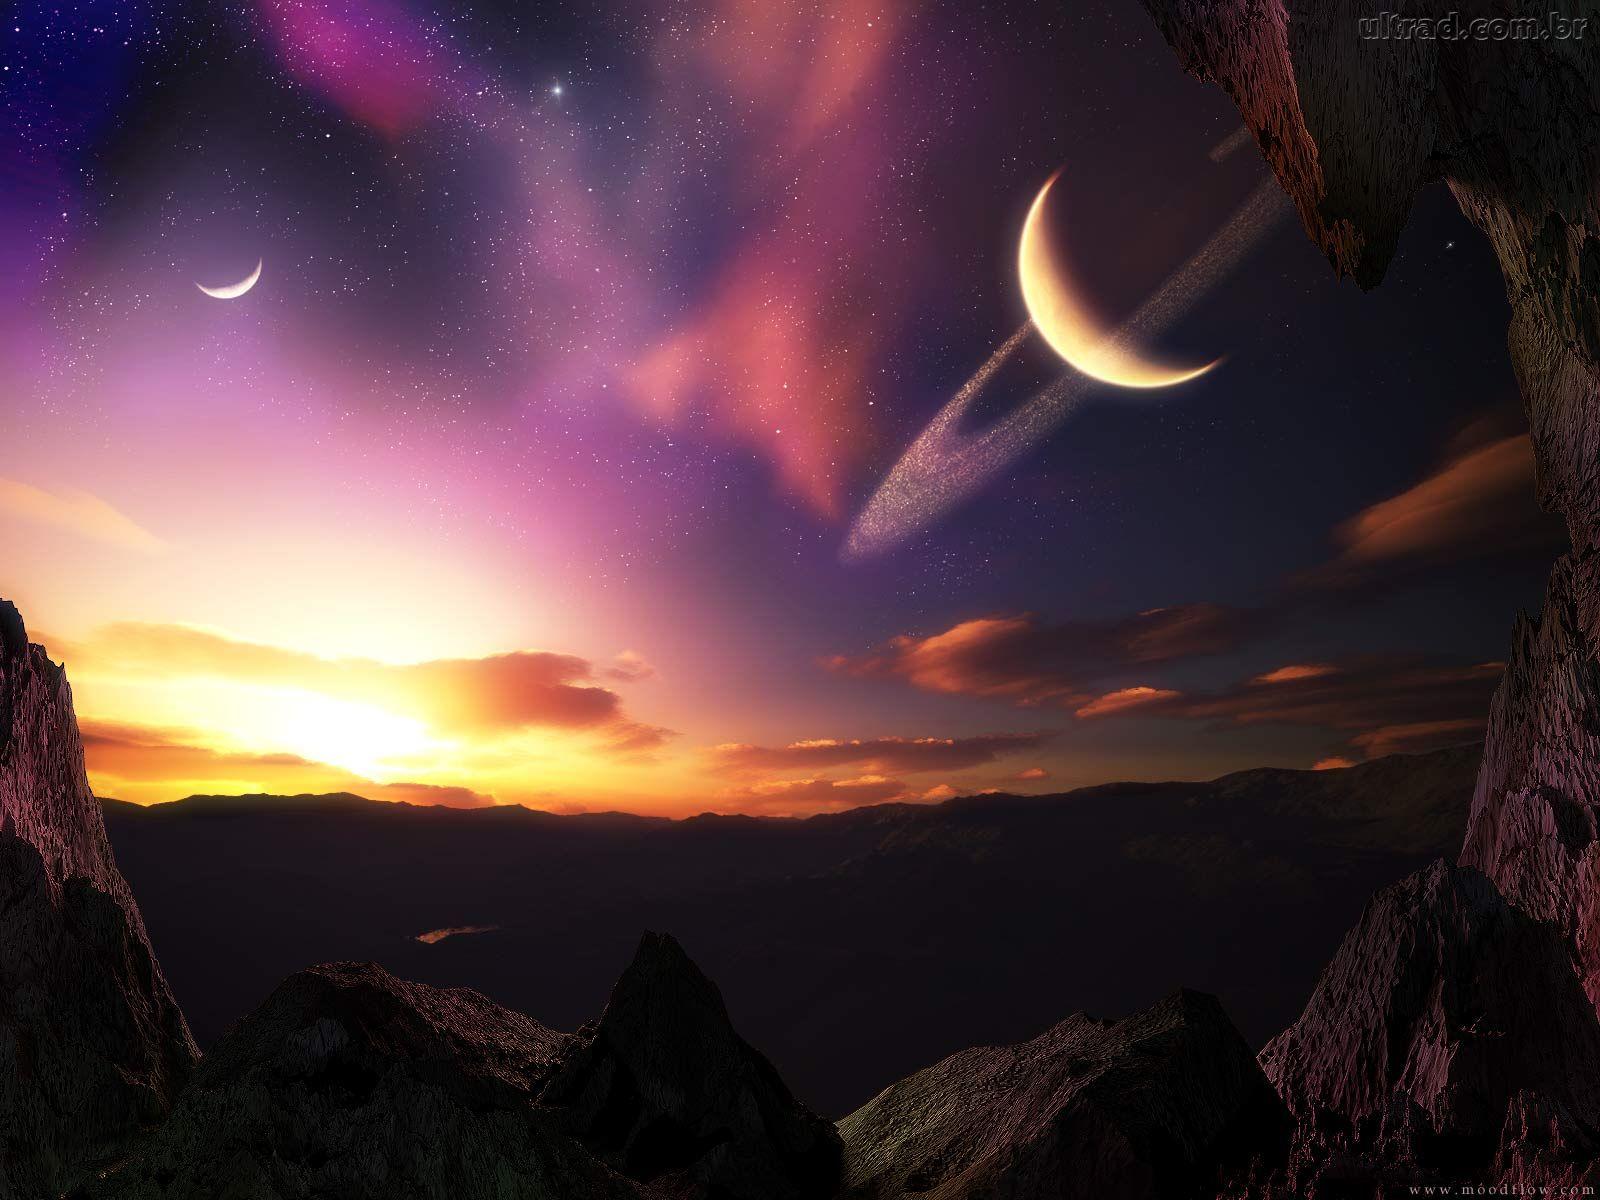 http://4.bp.blogspot.com/-B8tsKcj3kbs/TiTiHgr2J3I/AAAAAAAACEA/v0R75YFz_-w/s1600/105450_Papel-de-Parede-Aurora-boreal--105450_1600x1200.jpg